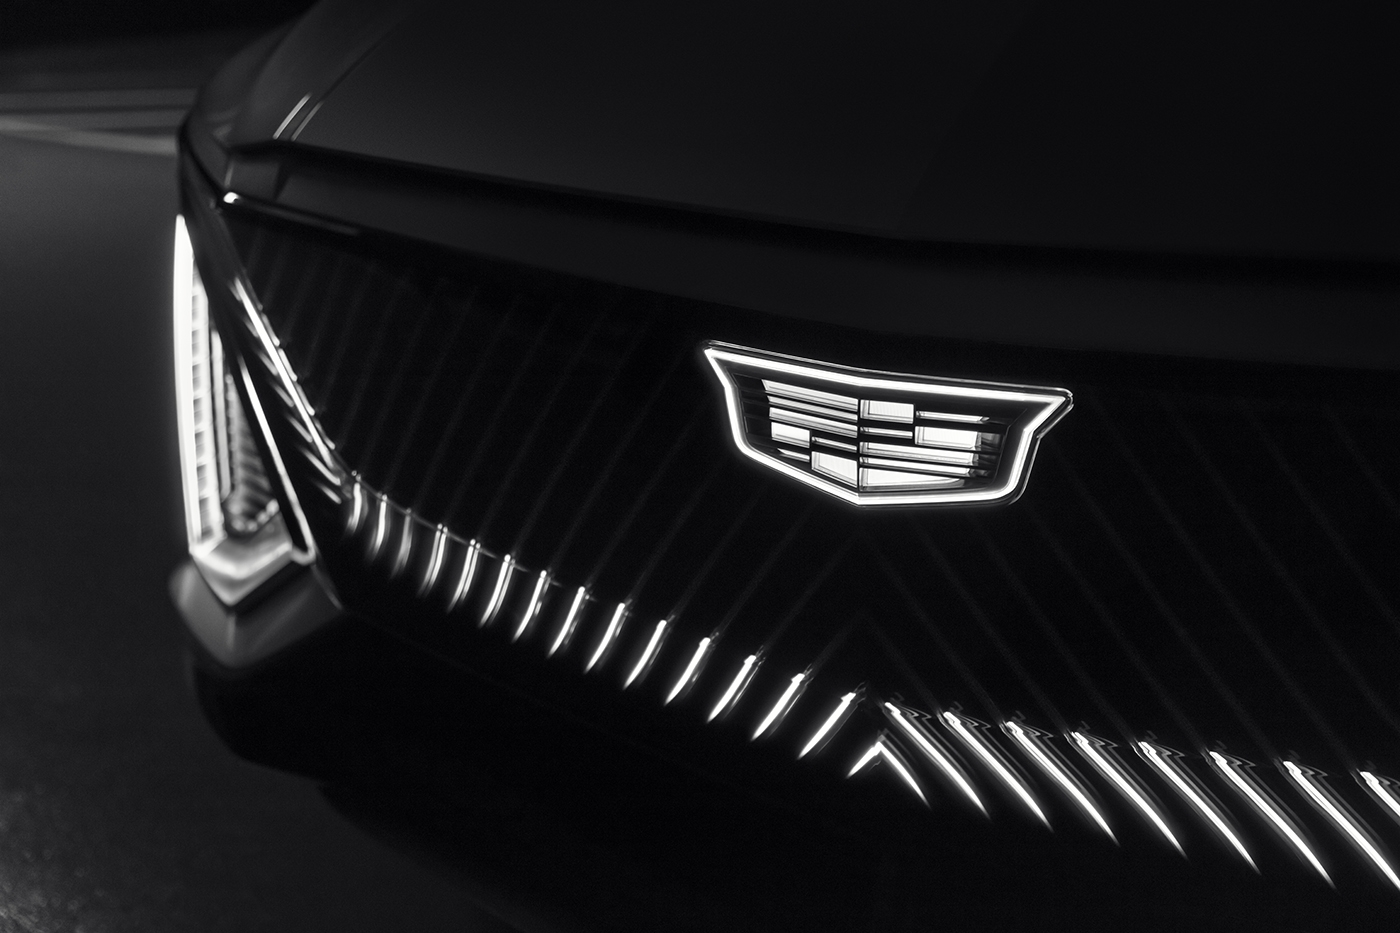 , Cadillac LYRIQ, Its First-Ever Luxury All-Electric Car, Saubio Making Wealth